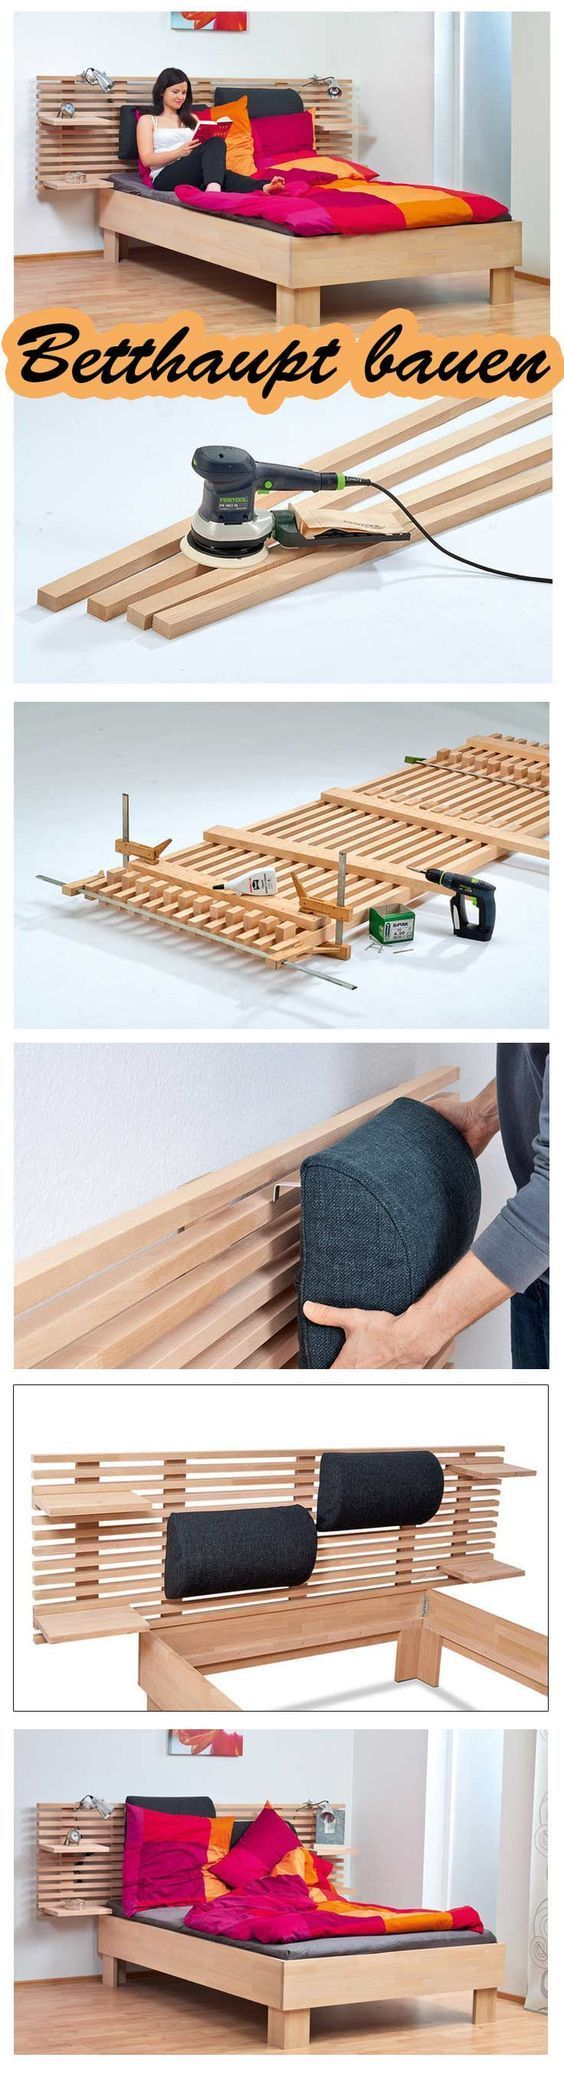 die besten 25 leselampe bett ideen auf pinterest leselampe f r das bett dreietagenbett ikea. Black Bedroom Furniture Sets. Home Design Ideas